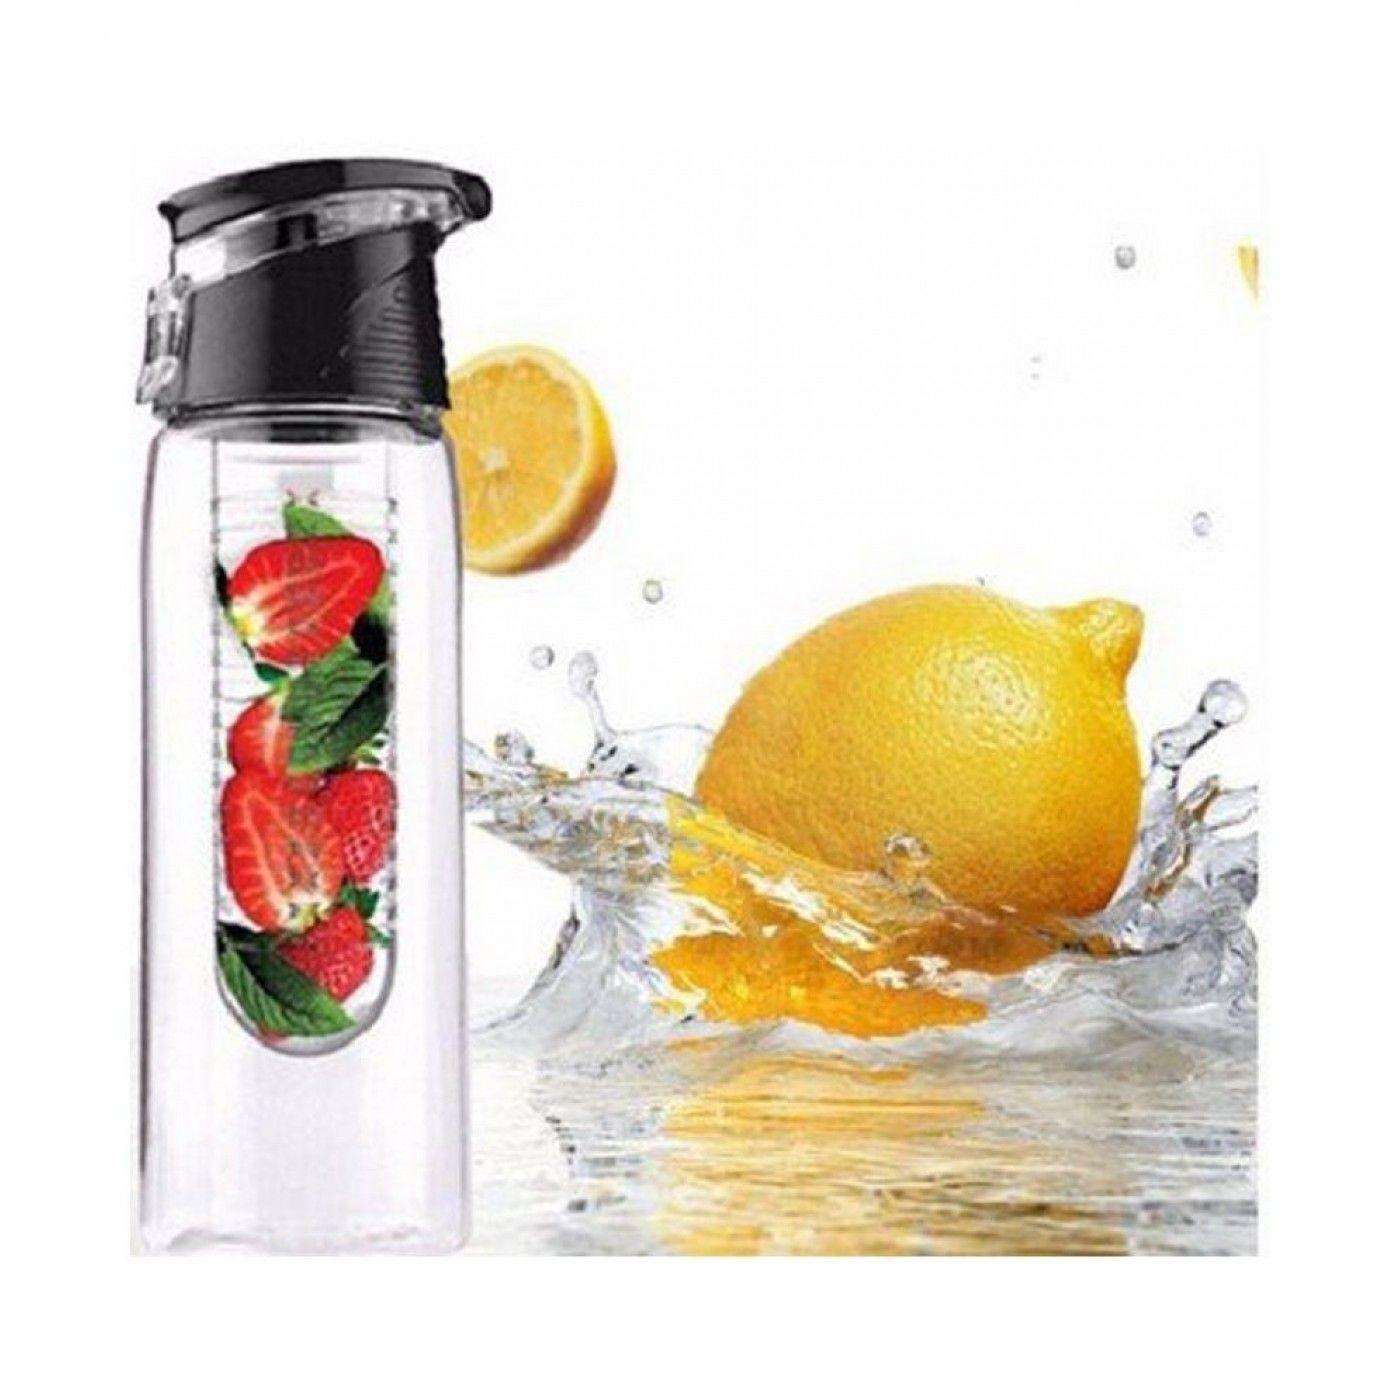 NEW CITRUS DRINK WATER INFUSE LEMON JUICE FLAVORED MAKER BPA FREE SPORTS BOTTLE